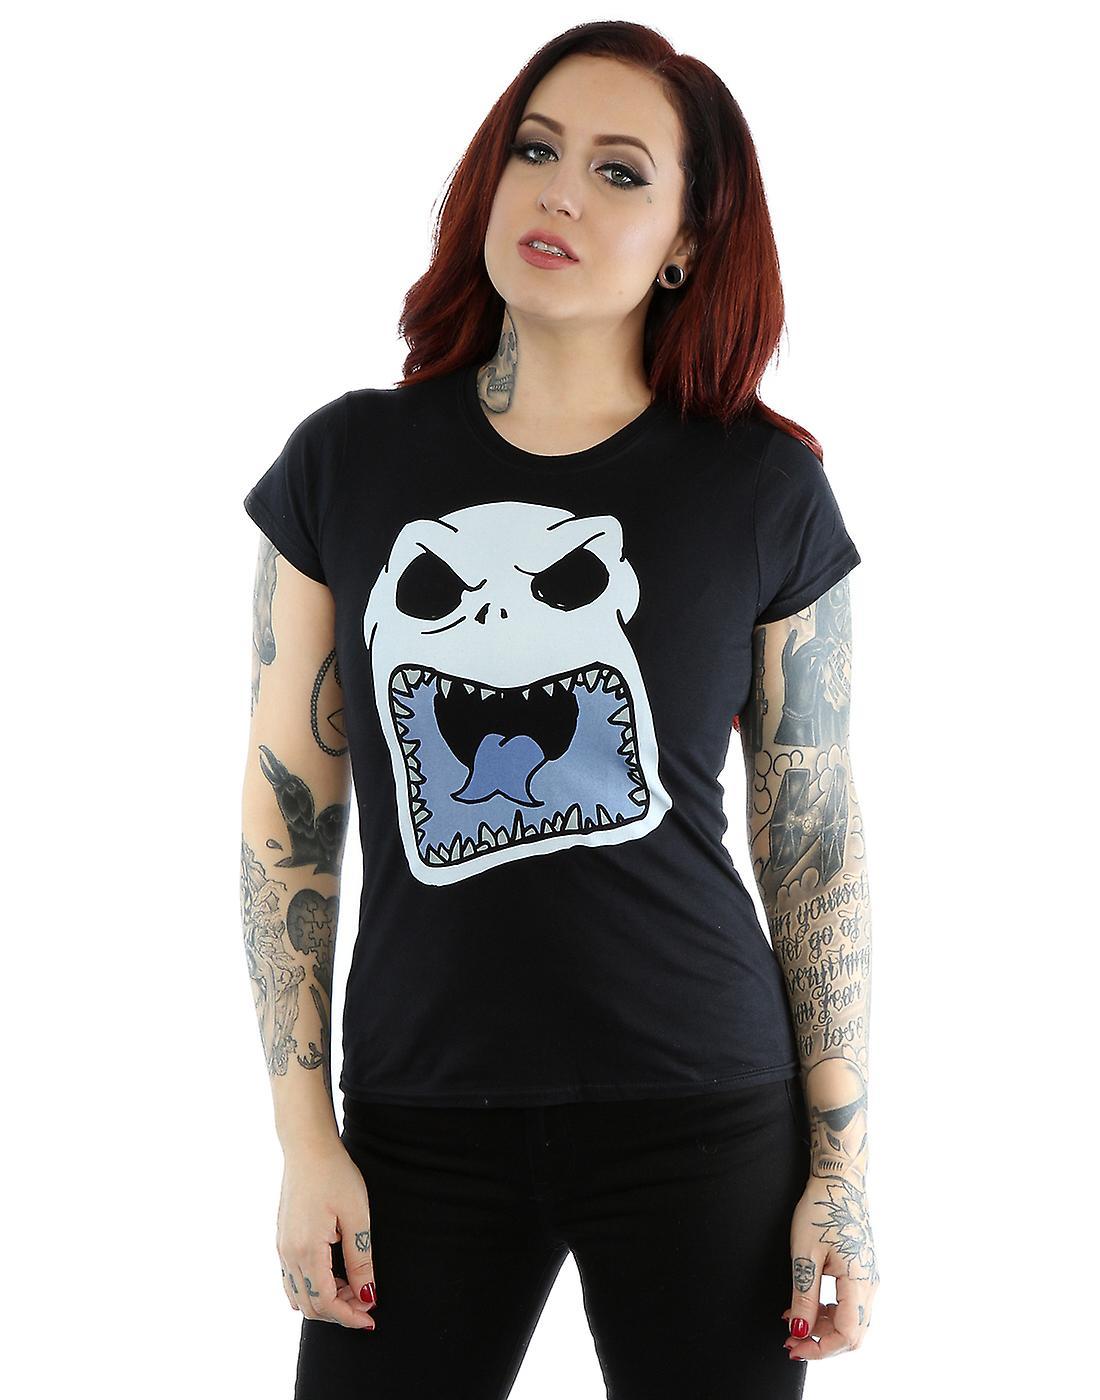 Halloween Jack Skellington Scary.Disney Women S Nightmare Before Christmas Jack Skellington Scary Face T Shirt